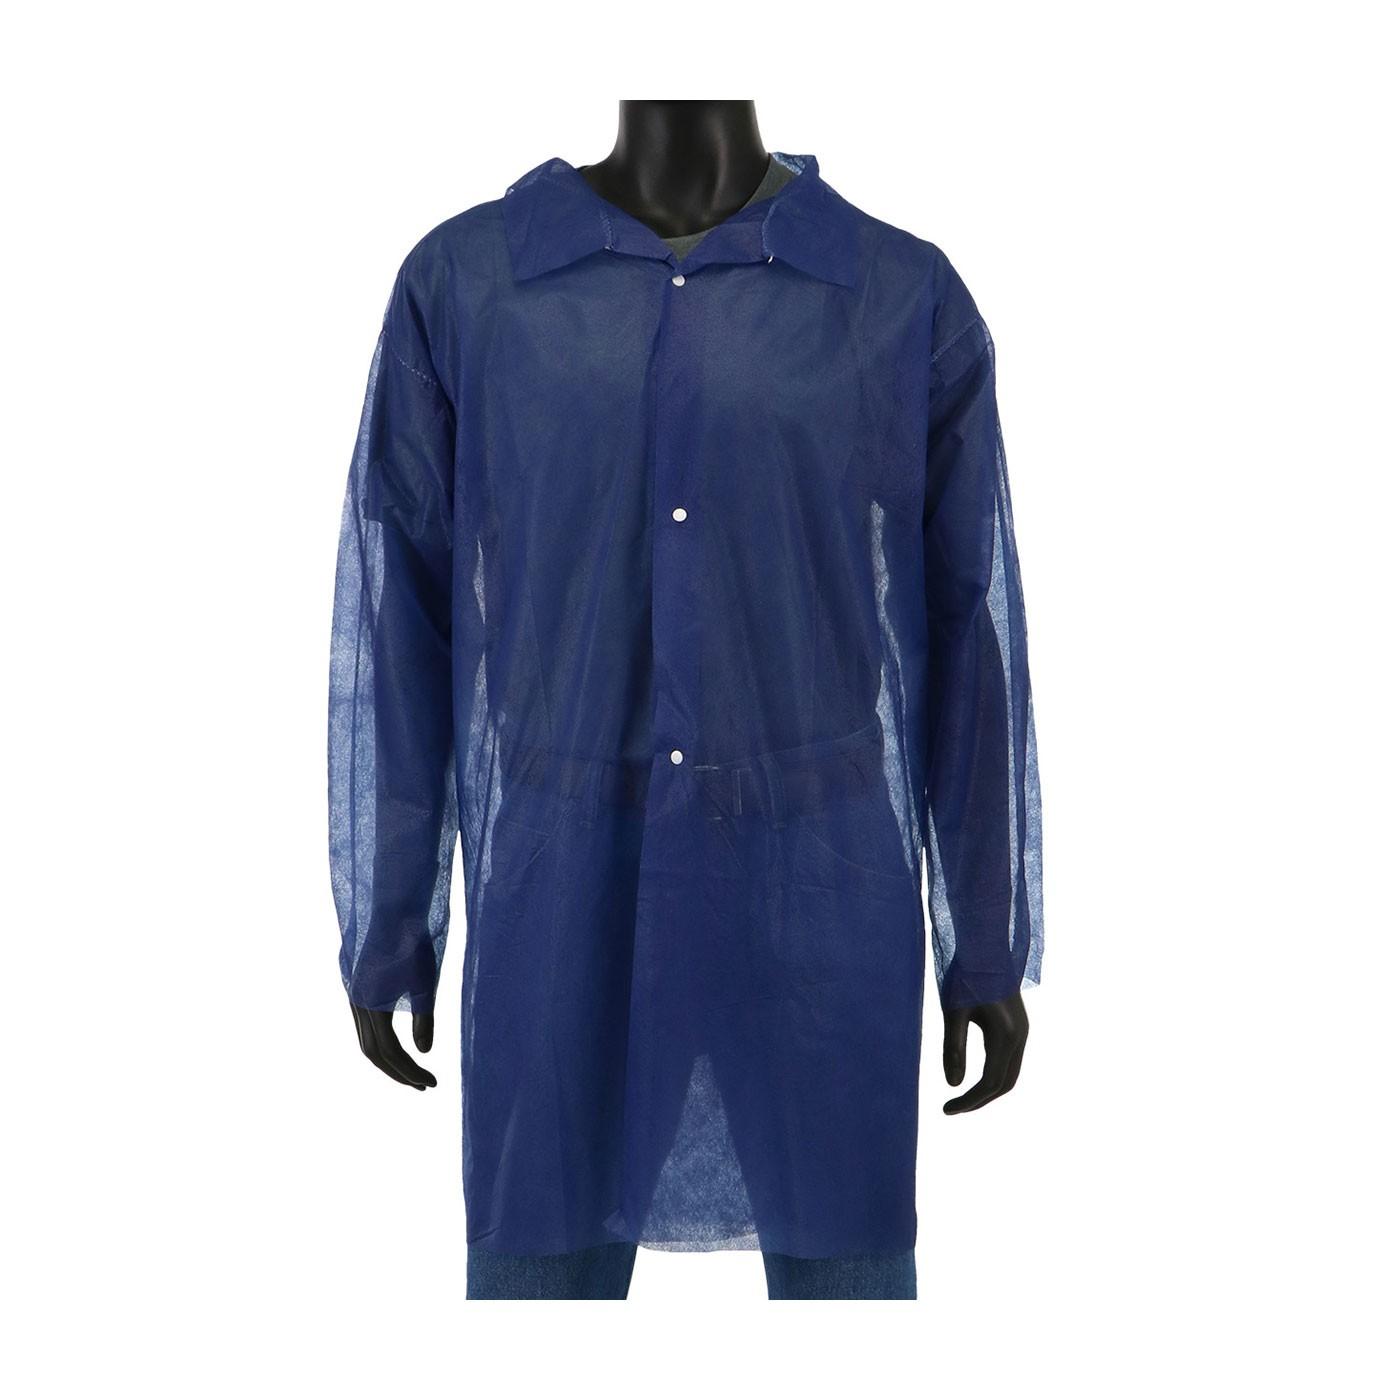 Standard Weight SBP Blue Lab Coat, No Pocket (#3511B)